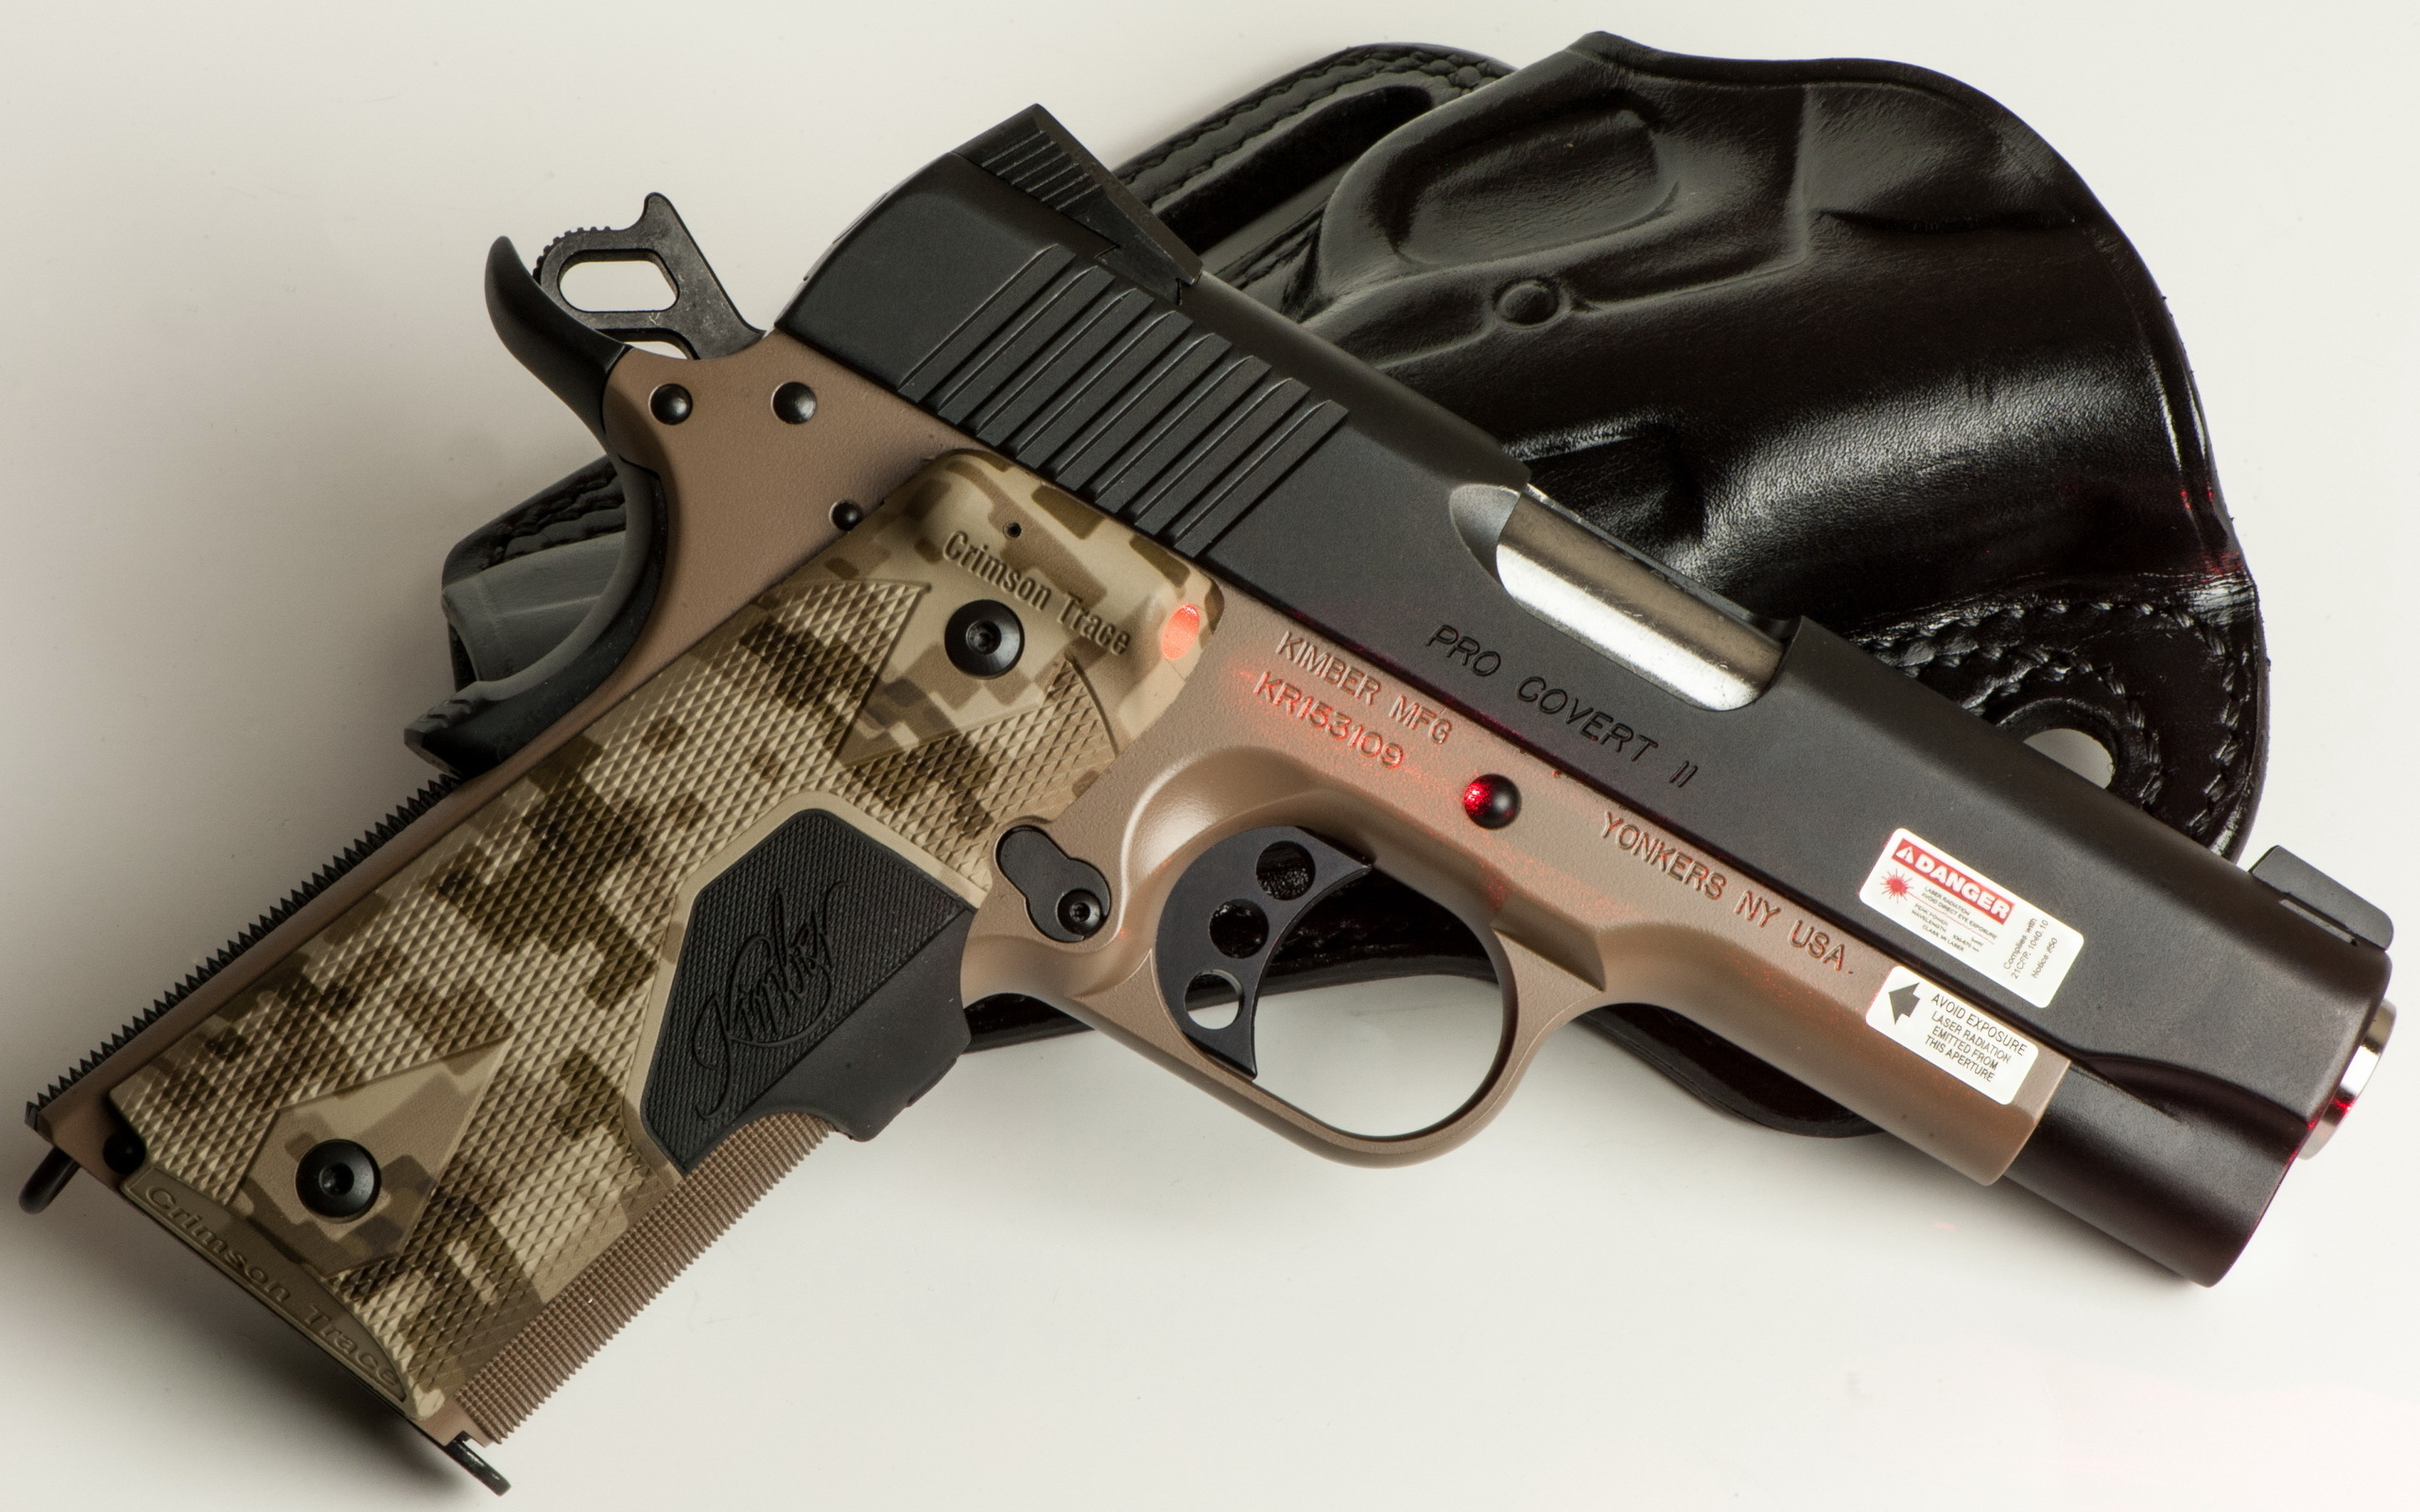 Glock Wallpaper Hd 1 Kimber Pro Covert Ii Pistol Hd Wallpapers Backgrounds